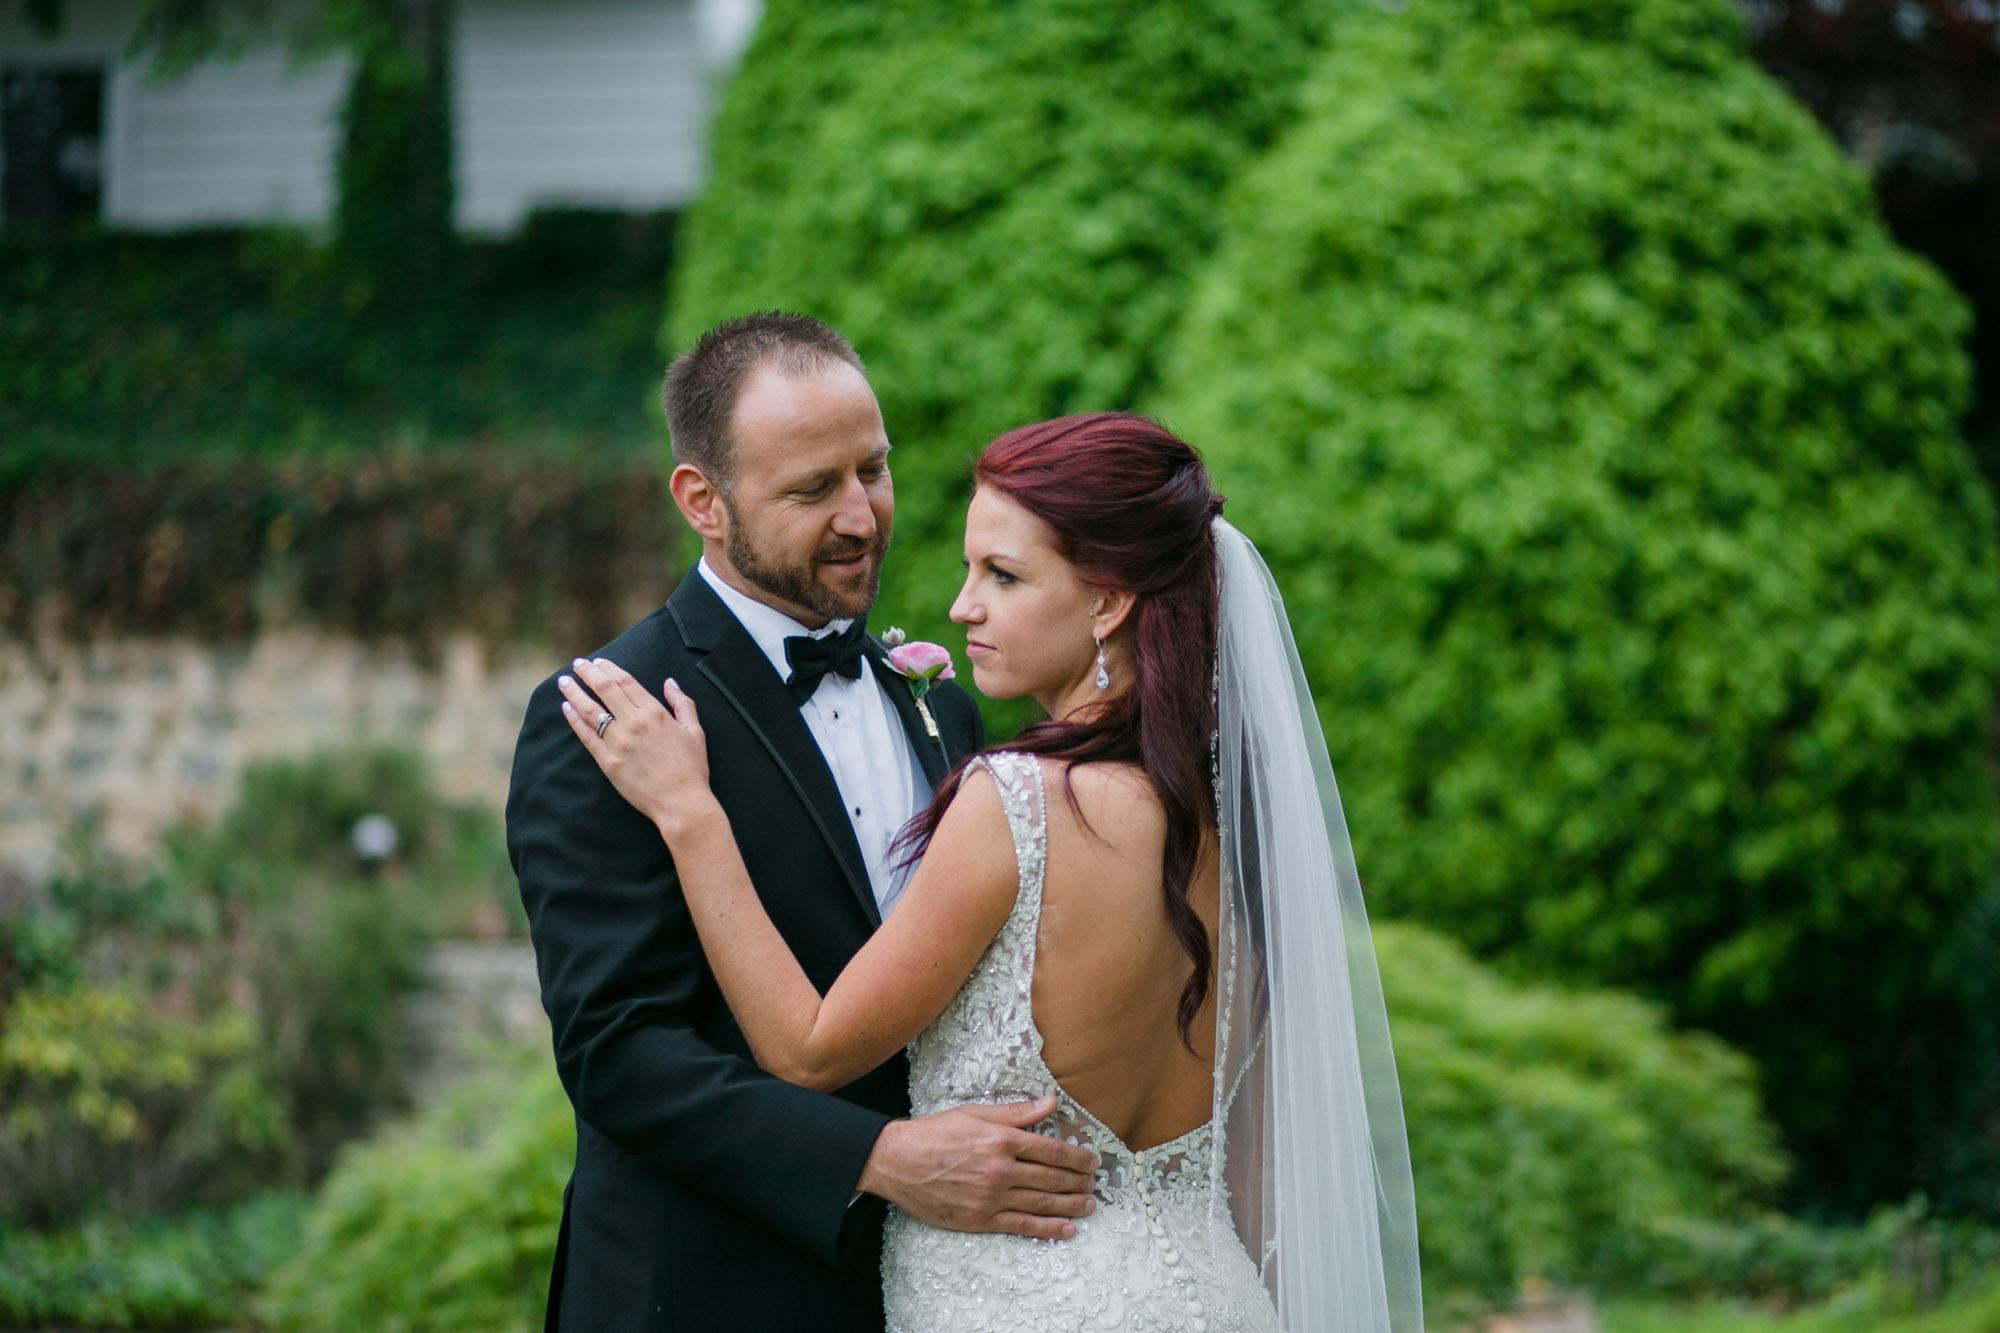 hensville-wedding-downtown-toledo-ohio (61 of 103).jpg